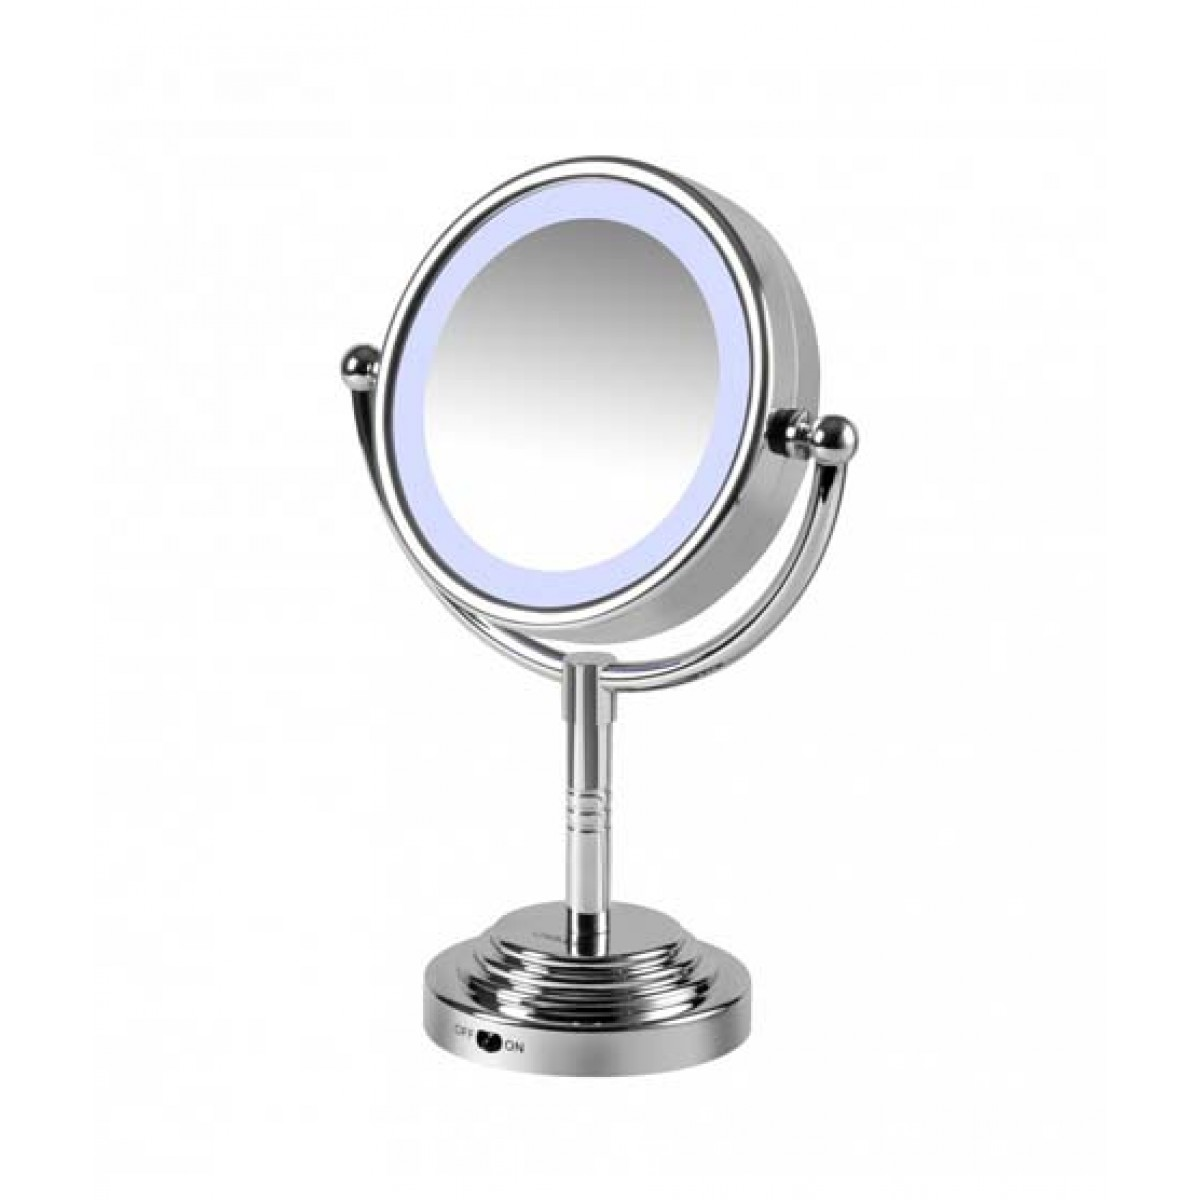 Carmen Core Dual Sided LED Illuminated Mirror (C85001)